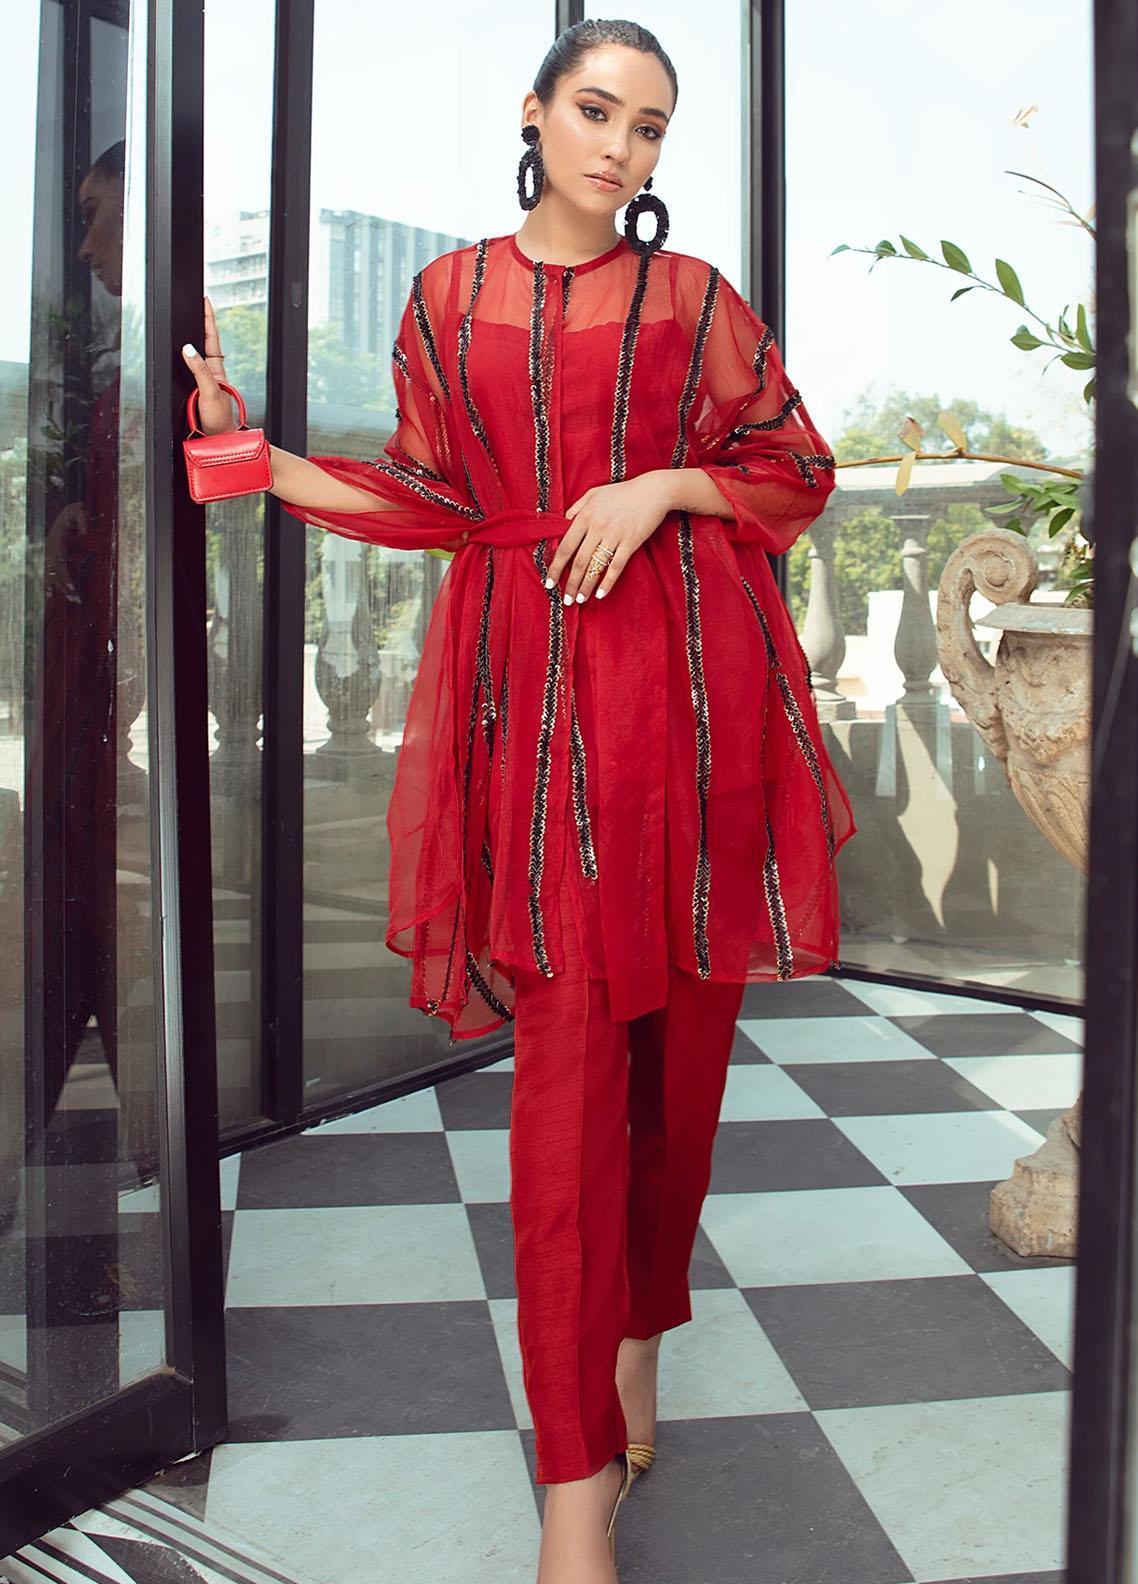 Vanya Party Wear Raw Silk Stitched 2 Piece Dress FJ-10